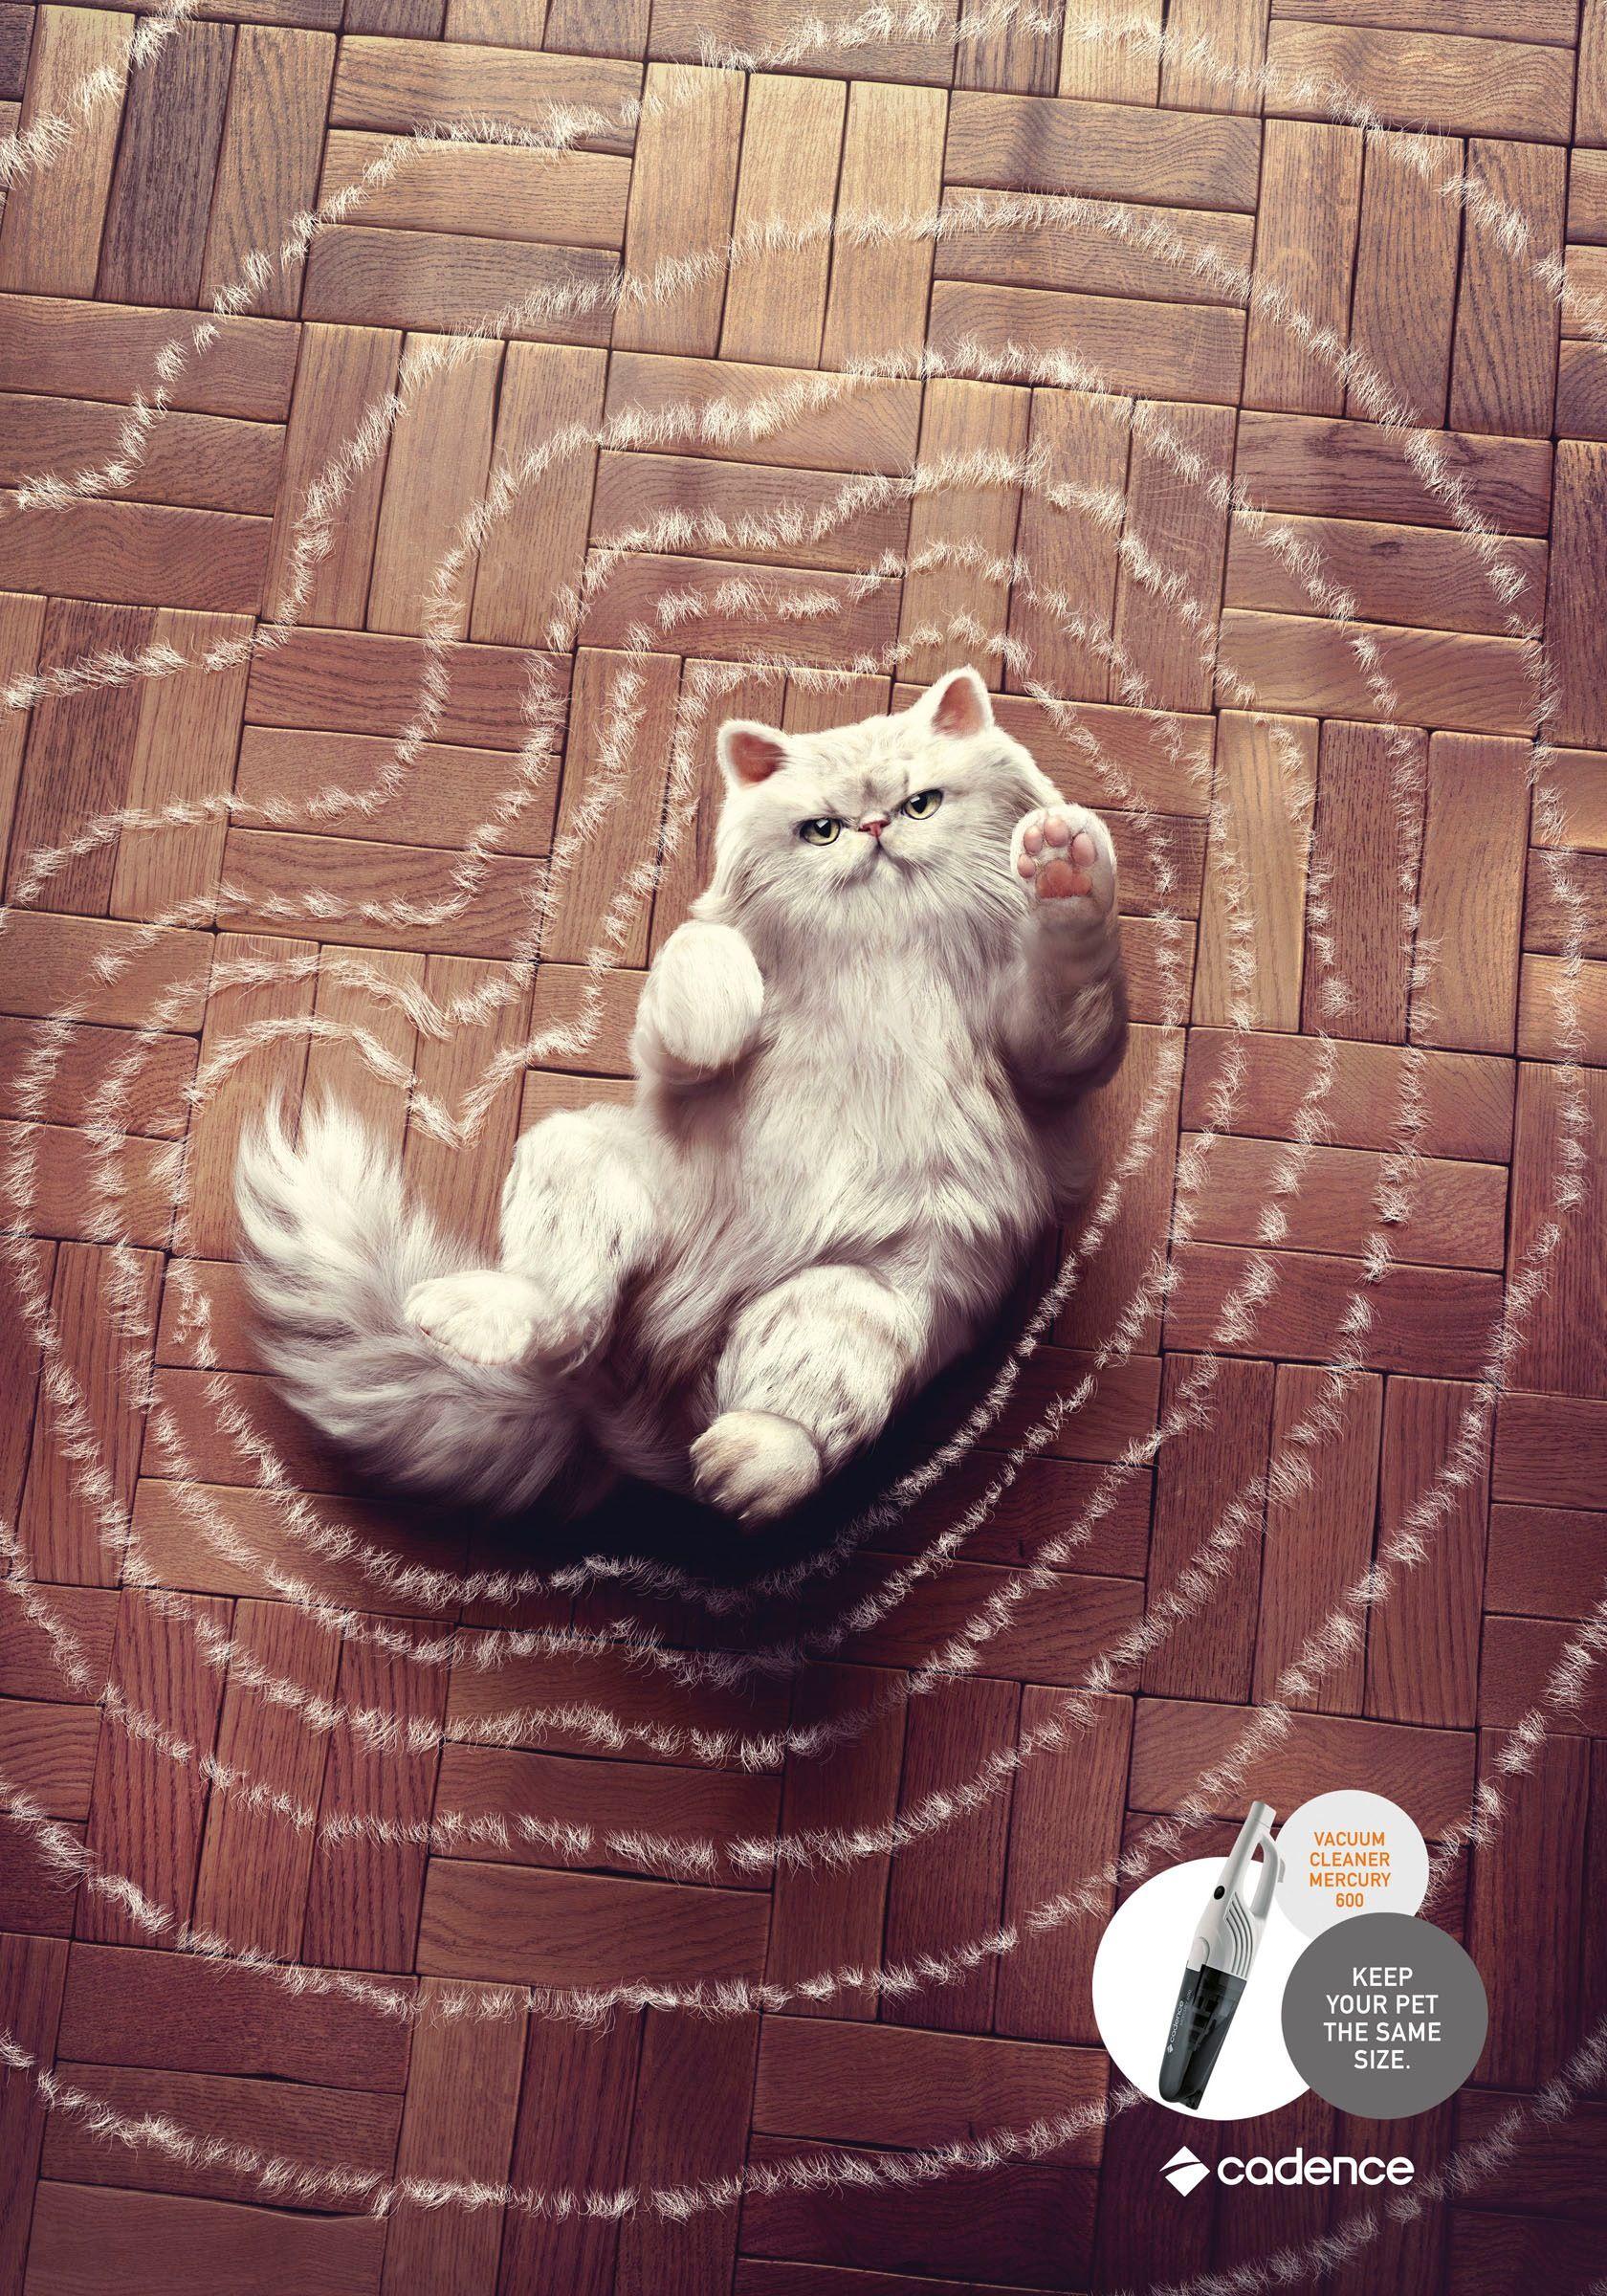 cadence-dog-cat-outdoor-print-361496-adeevee.jpg (1680×2400)